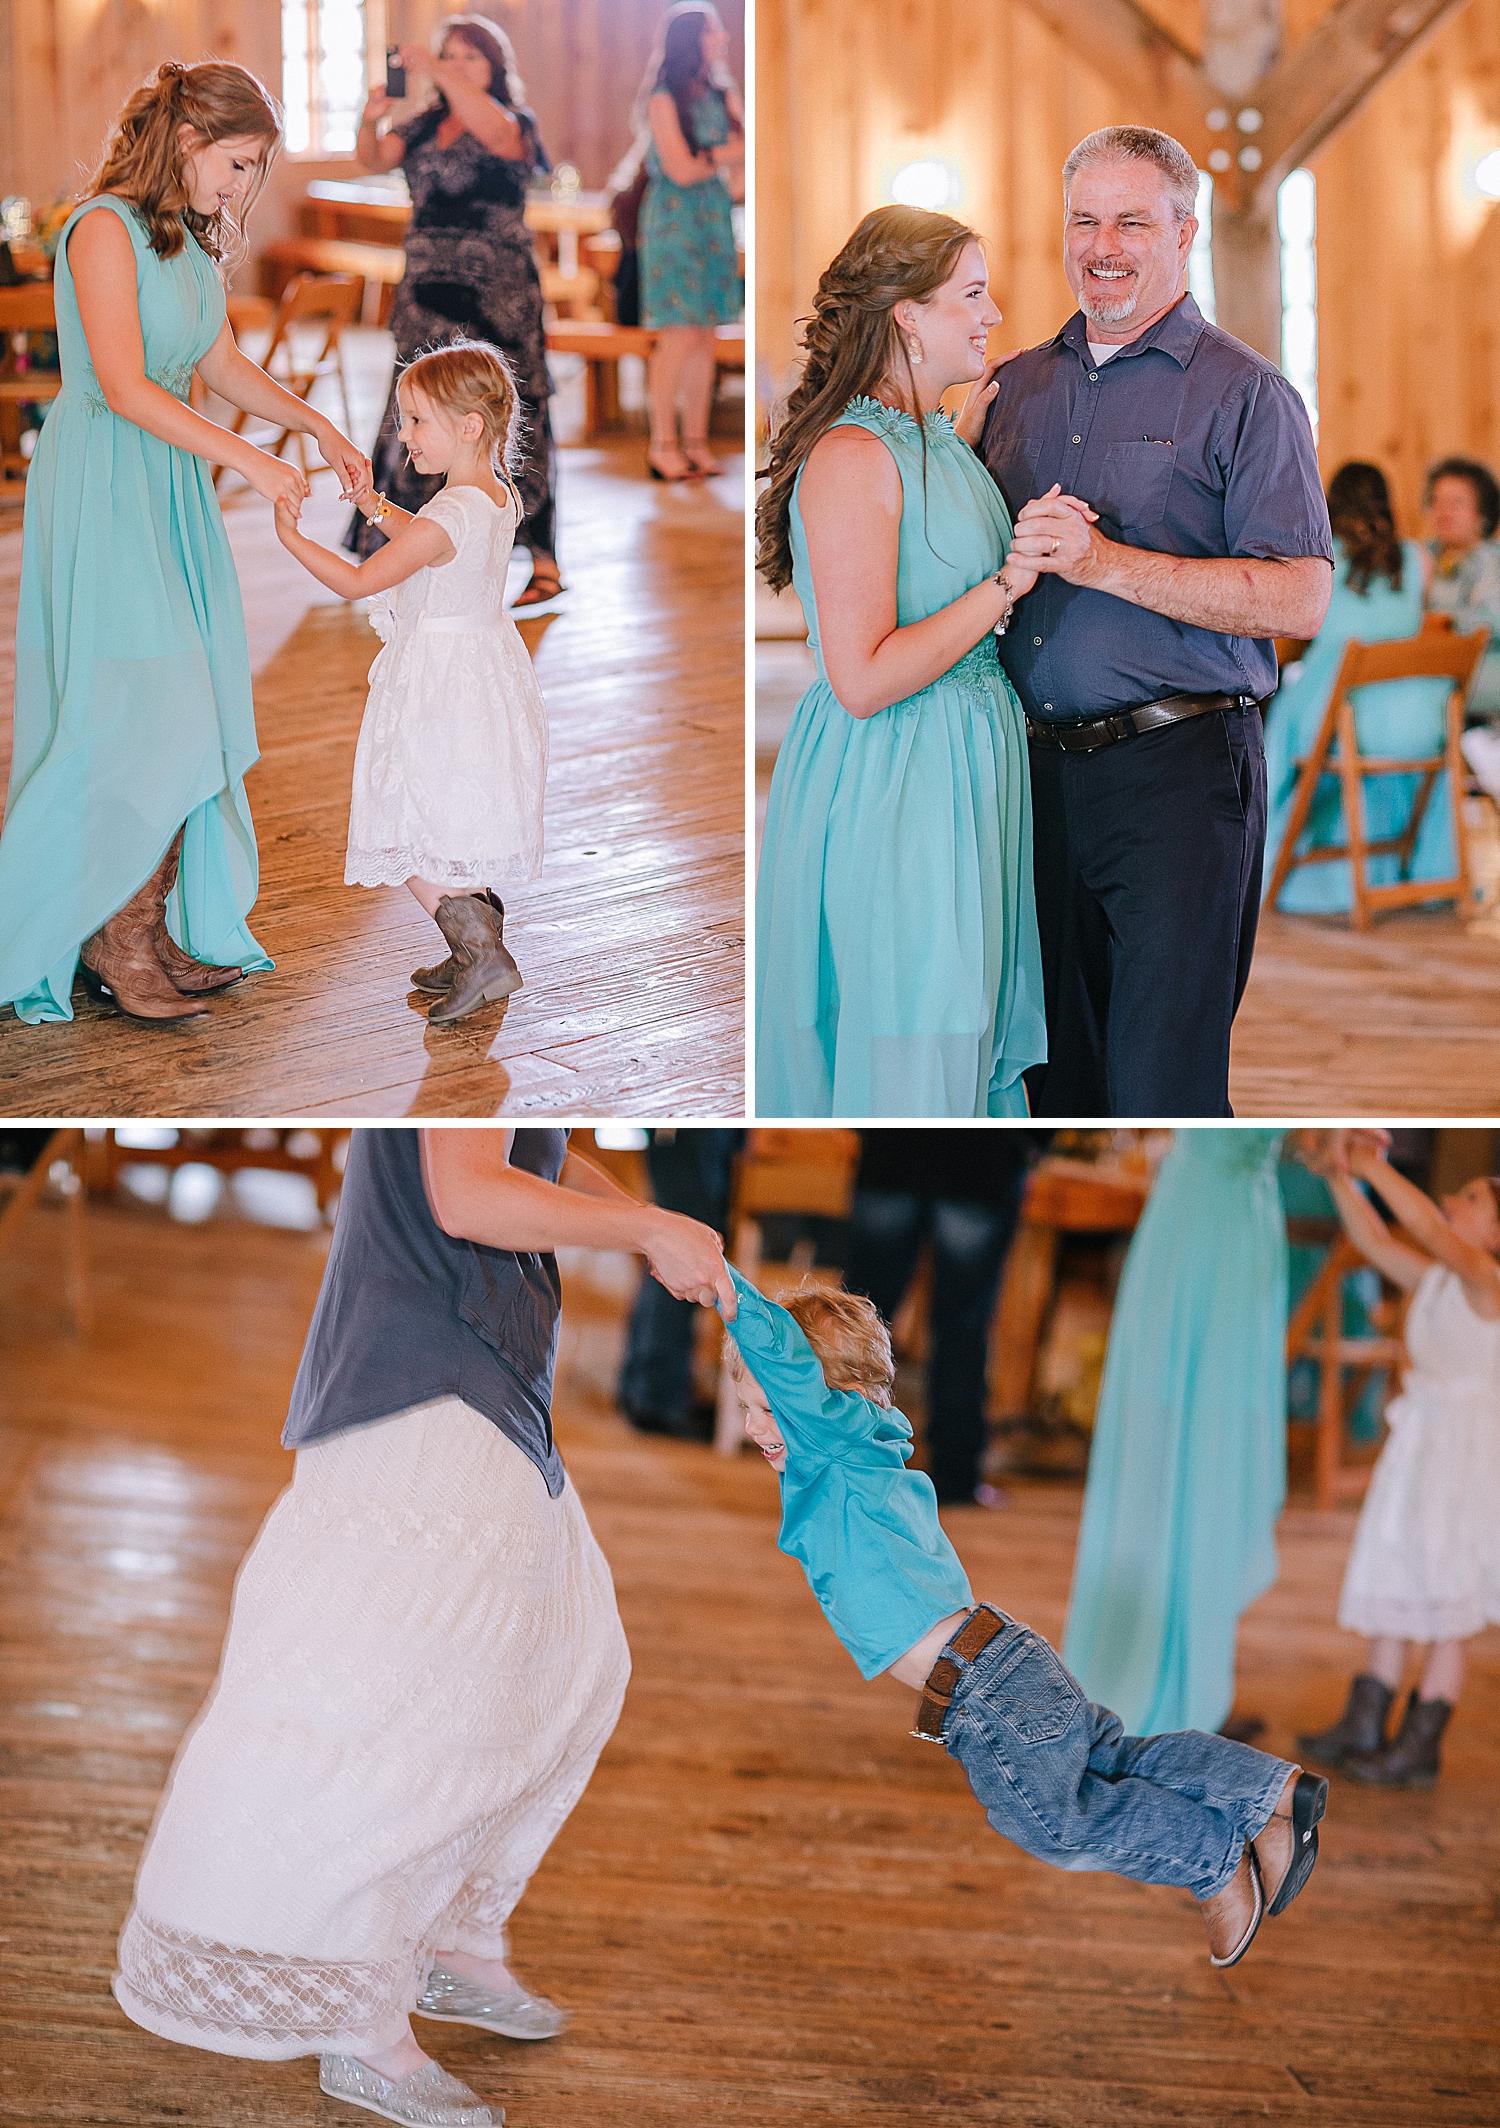 Carly-Barton-Photography-Old-Town-Texas-Rustic-Wedding-Photos-Sunflowers-Boots-Kyle-Texas_0089.jpg